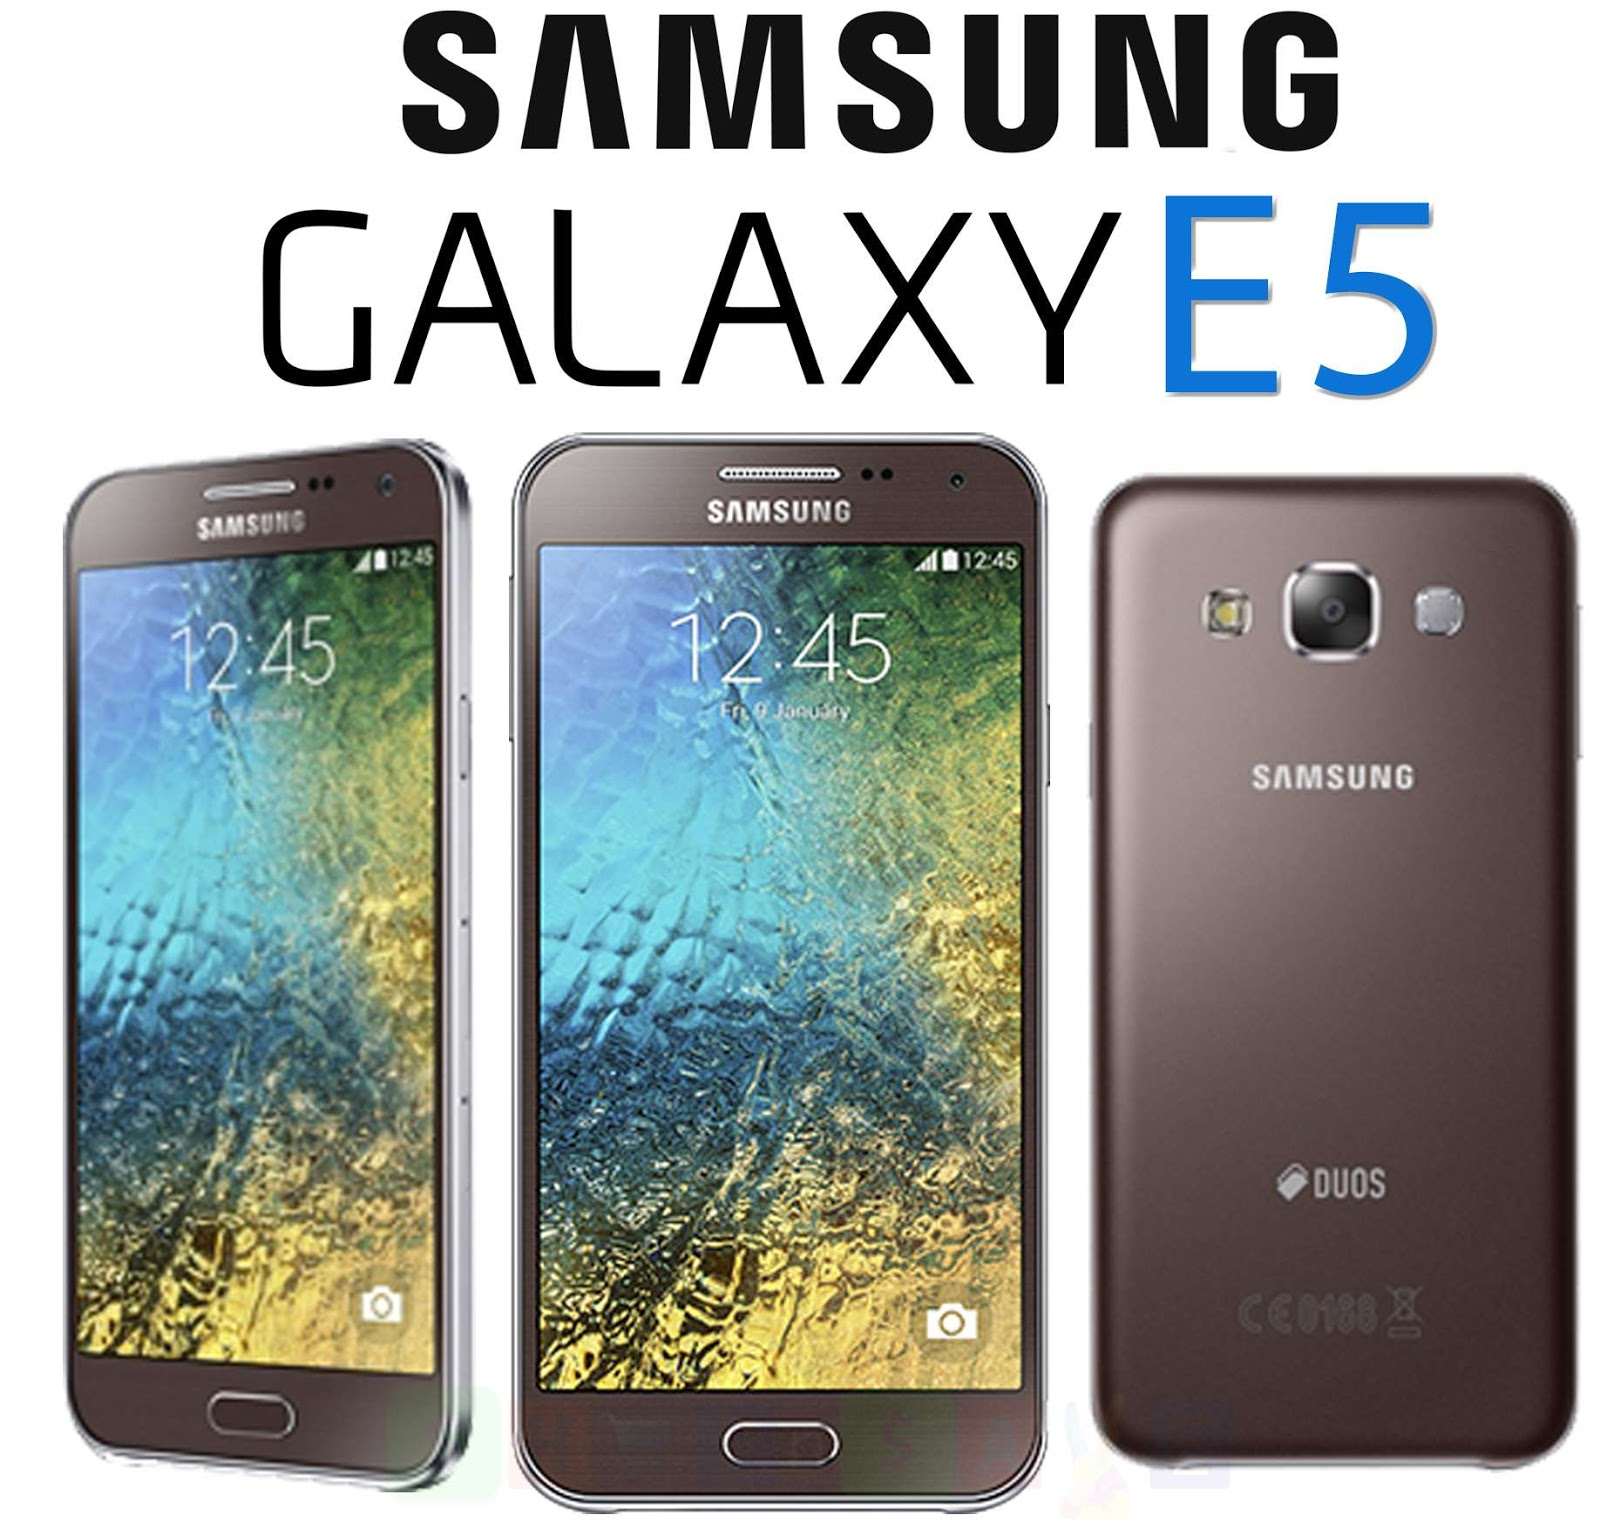 Spesifikasi HP Samsug Galaxy E5 Terbaru